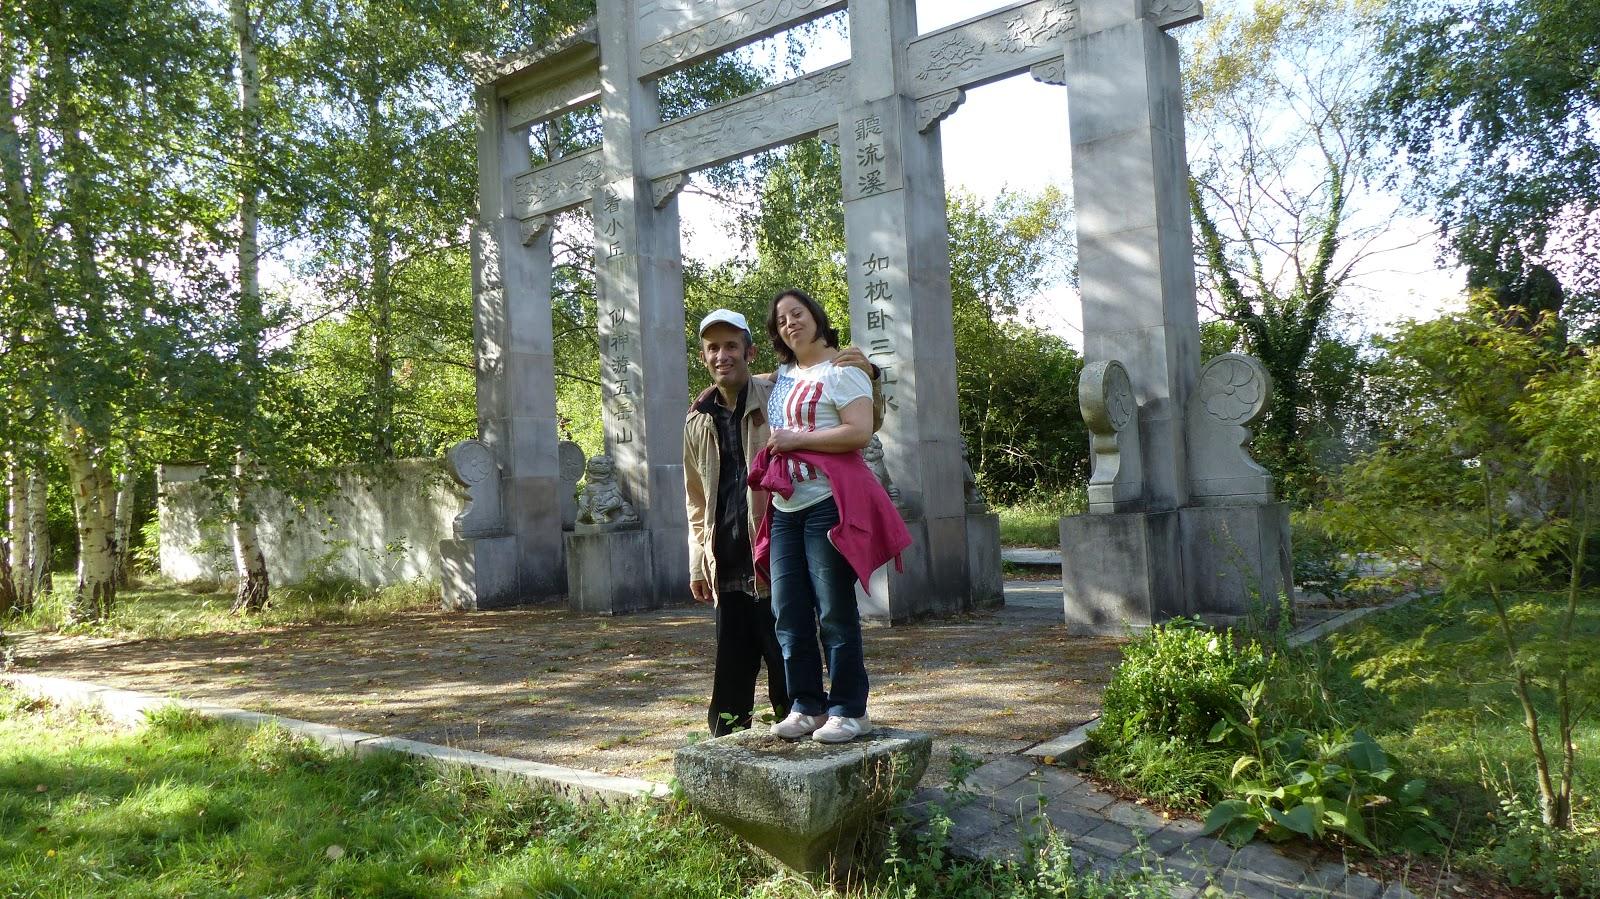 Club amiti partage weekend dans les yvelines for Promenade dans les yvelines